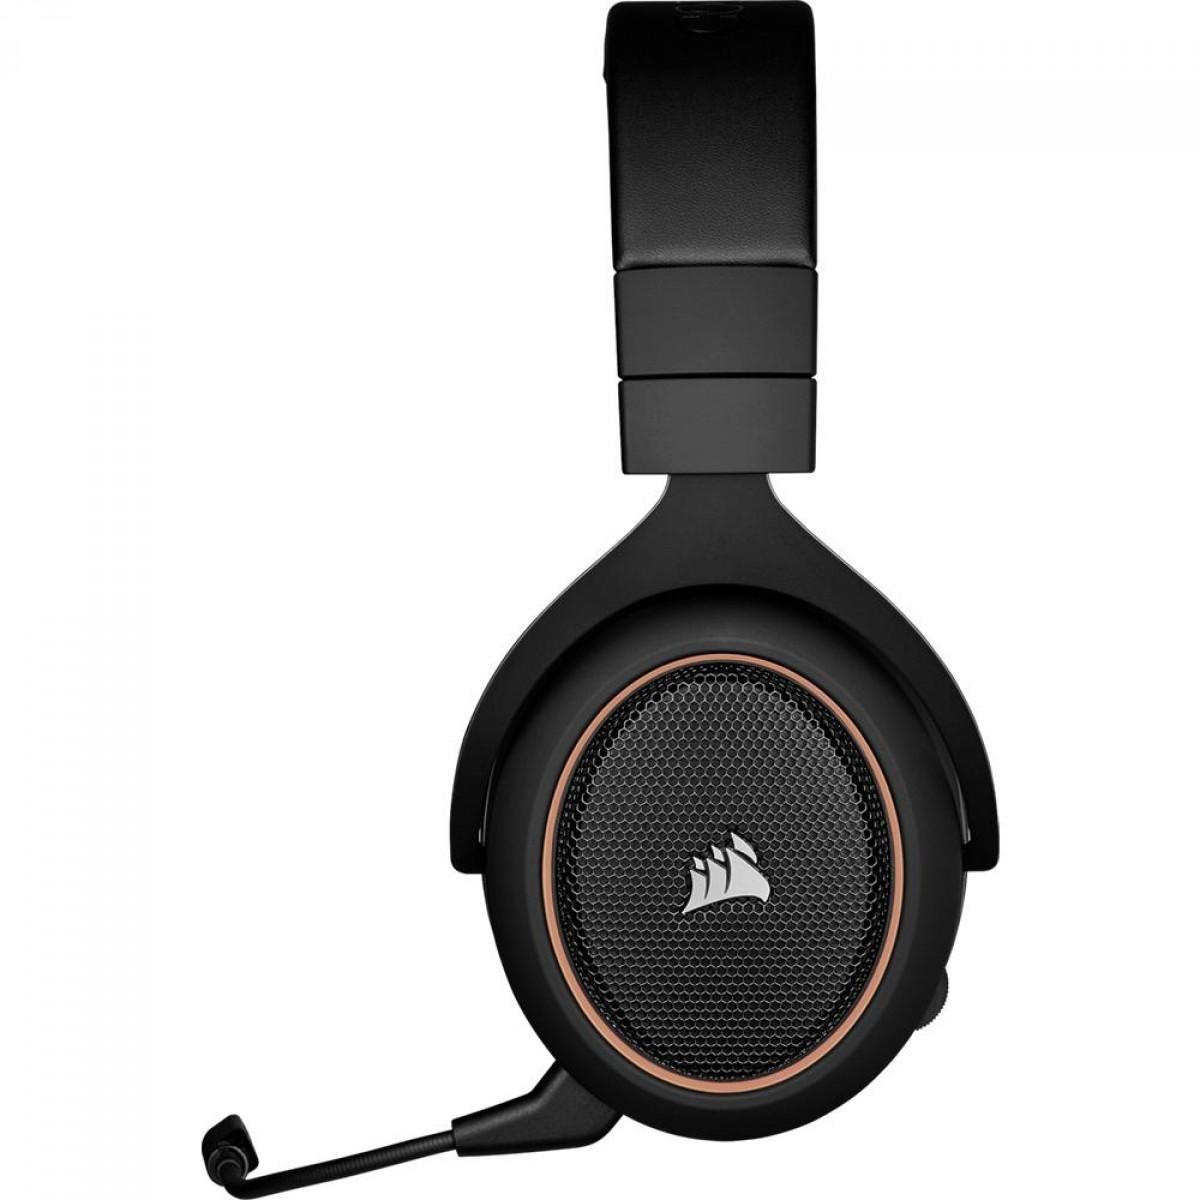 Headset Gamer Corsair HS70 PRO Wireless, 7.1 Surround, USB, PC, PS4/5, Black/Cream, CA-9011210-NA